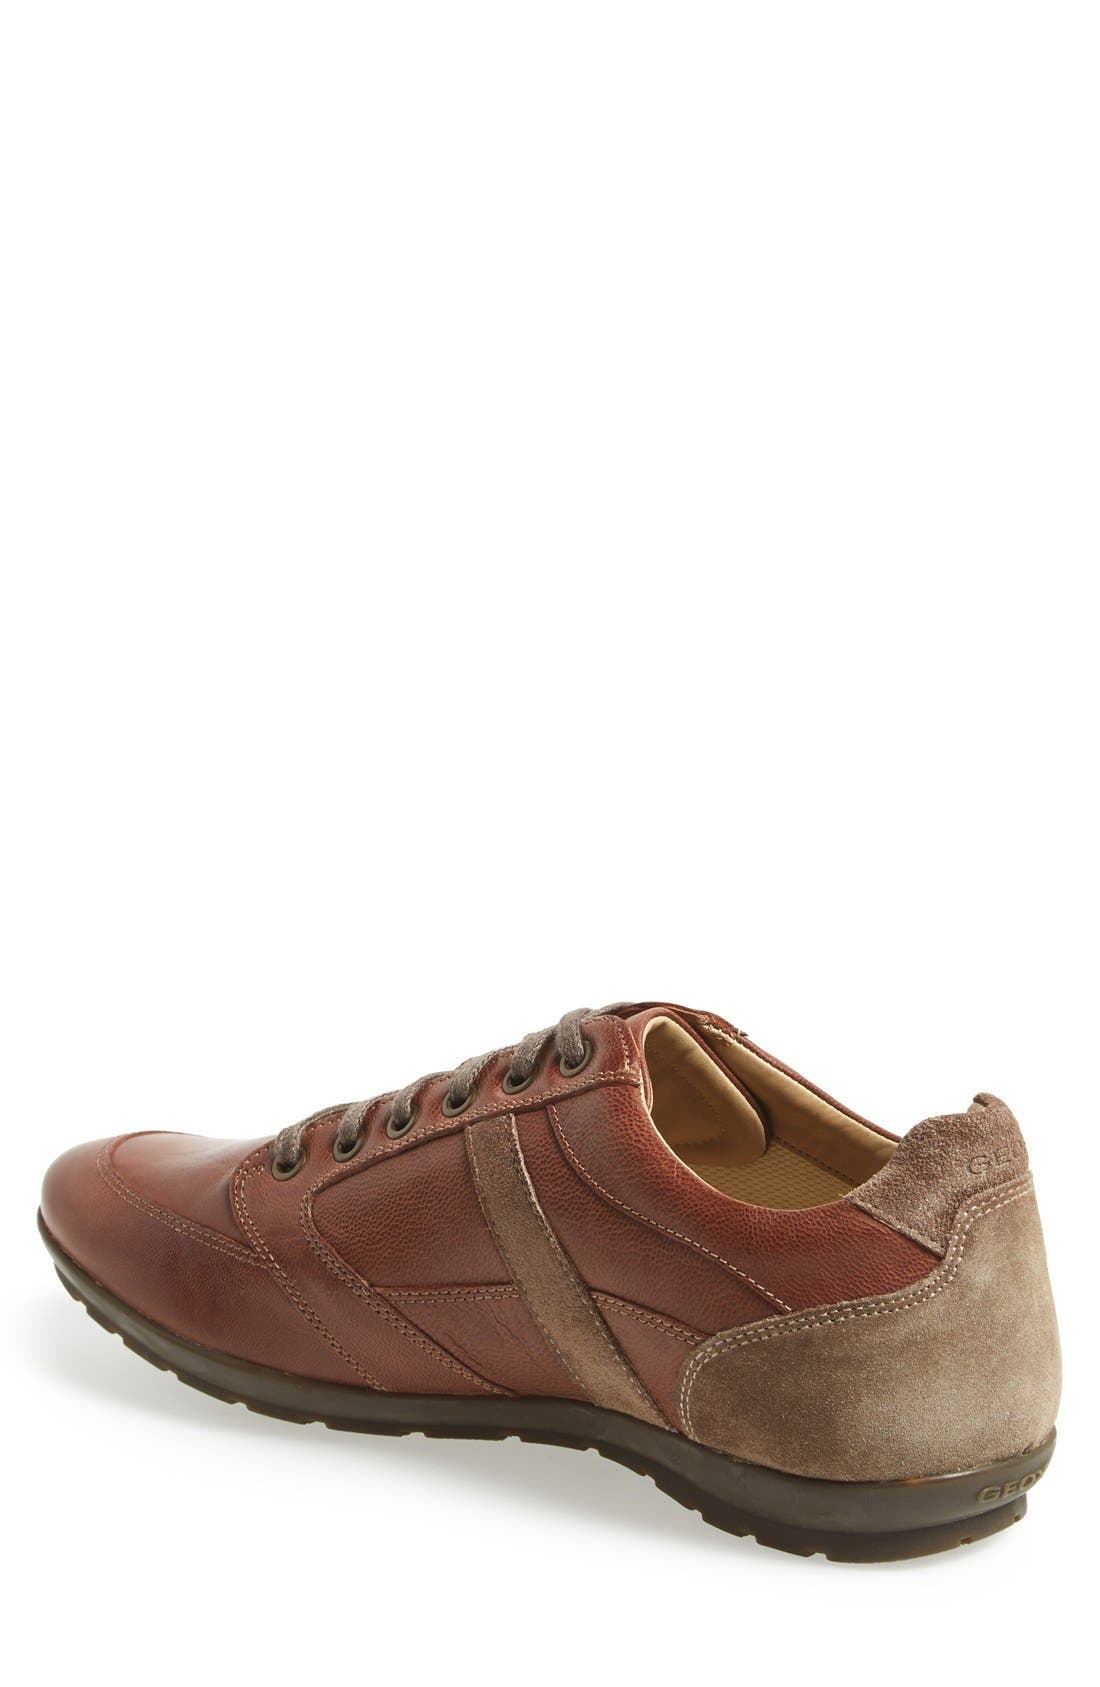 'Symbol 6' Sneaker,                             Alternate thumbnail 2, color,                             210